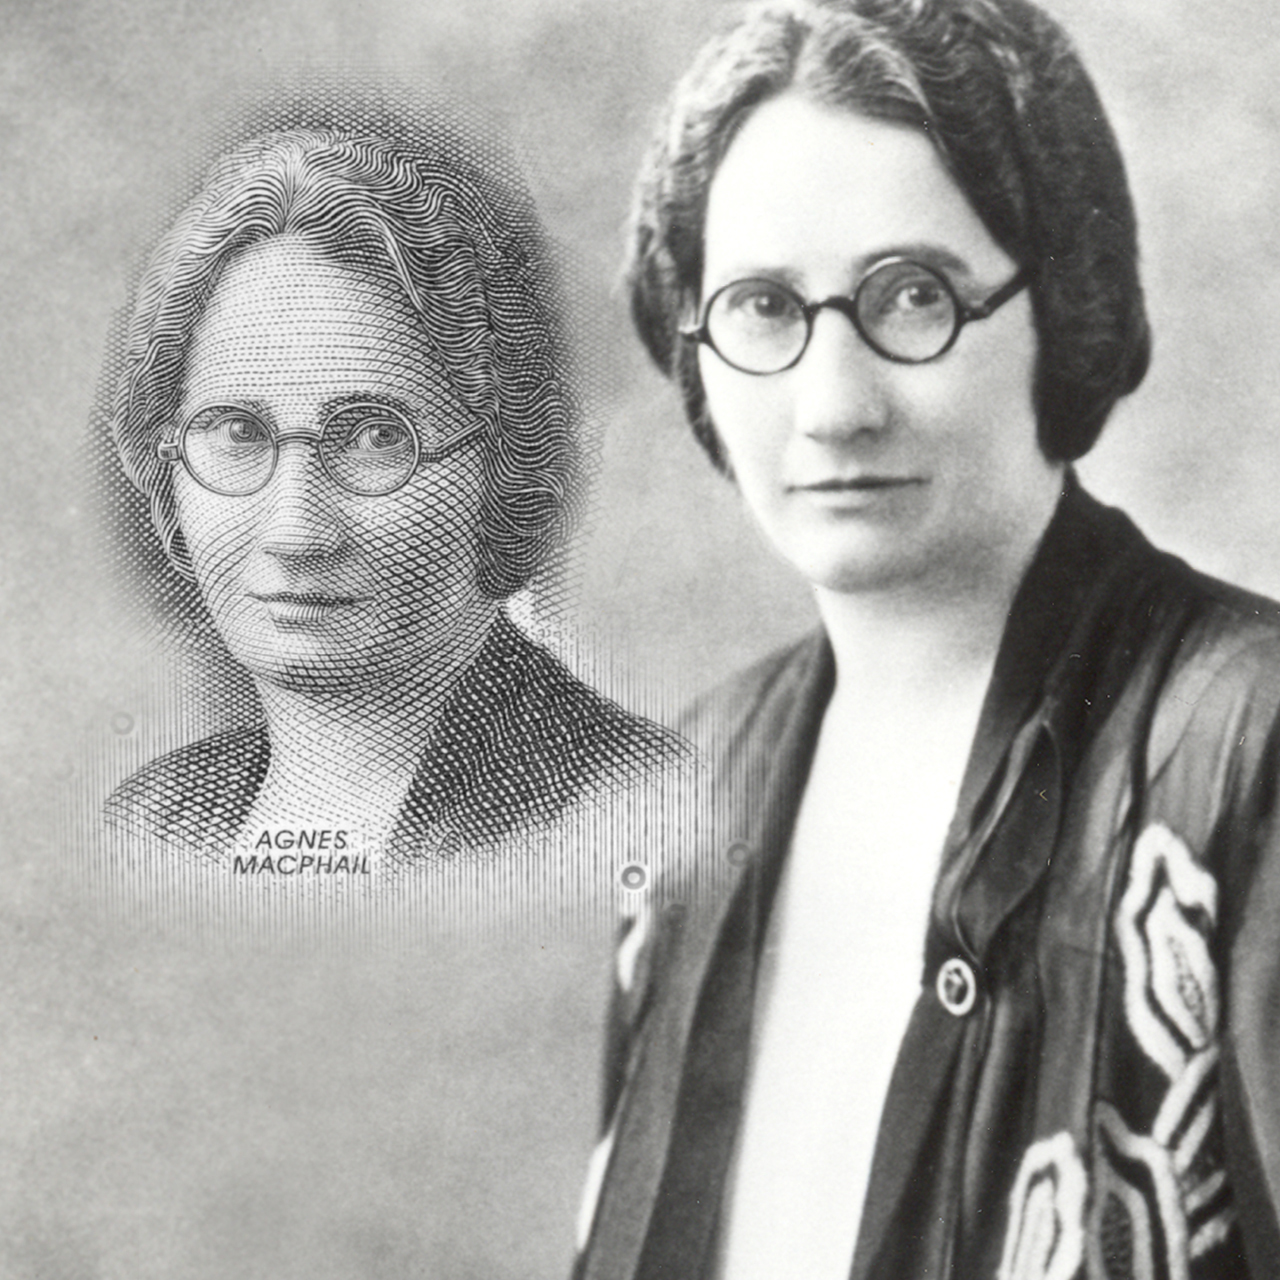 historic photo of Agnes Macphail